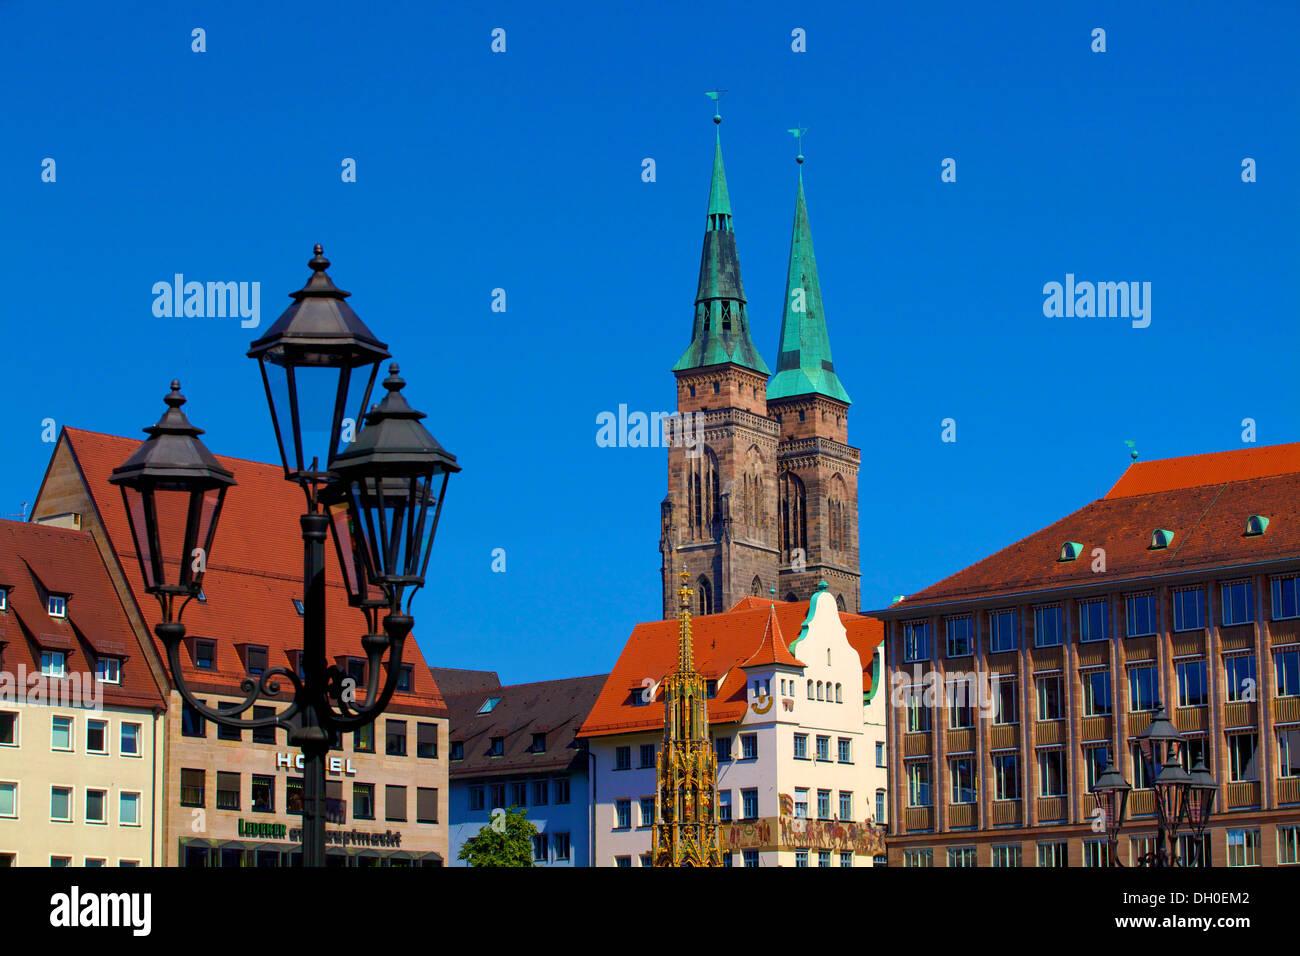 Schoener Brunnen Fountain, Market Square and St. Sebaldus Church, Nuremberg, Bavaria, Germany, Europe Stock Photo